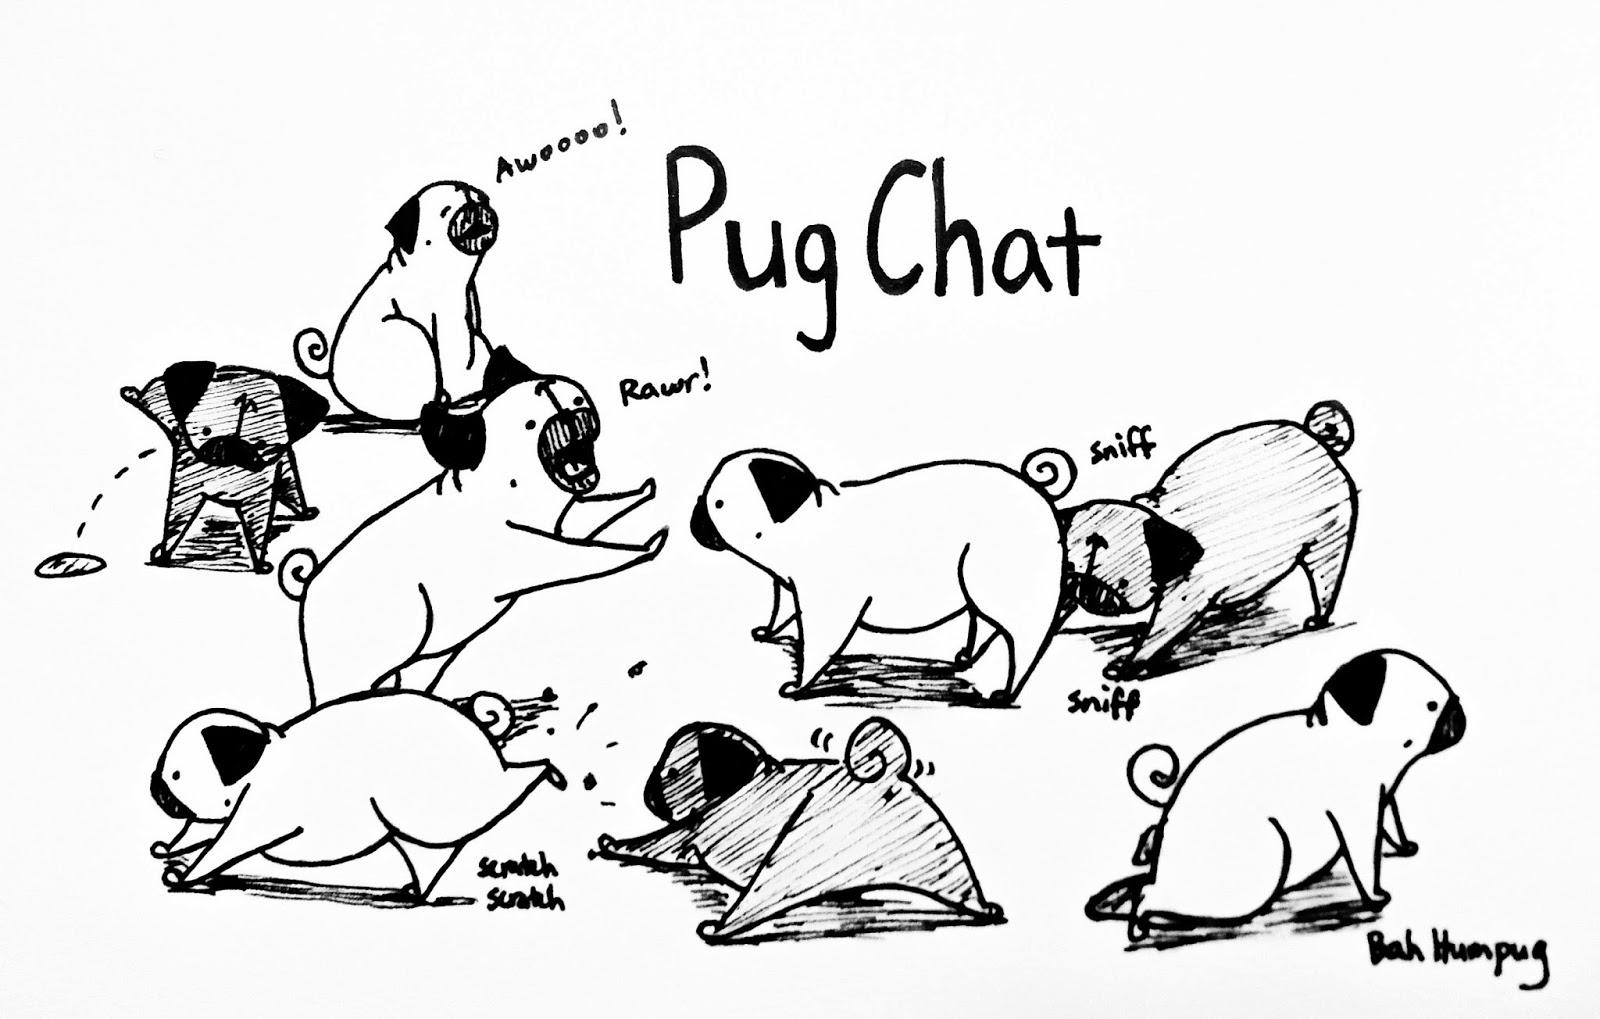 bah humpug pug chat